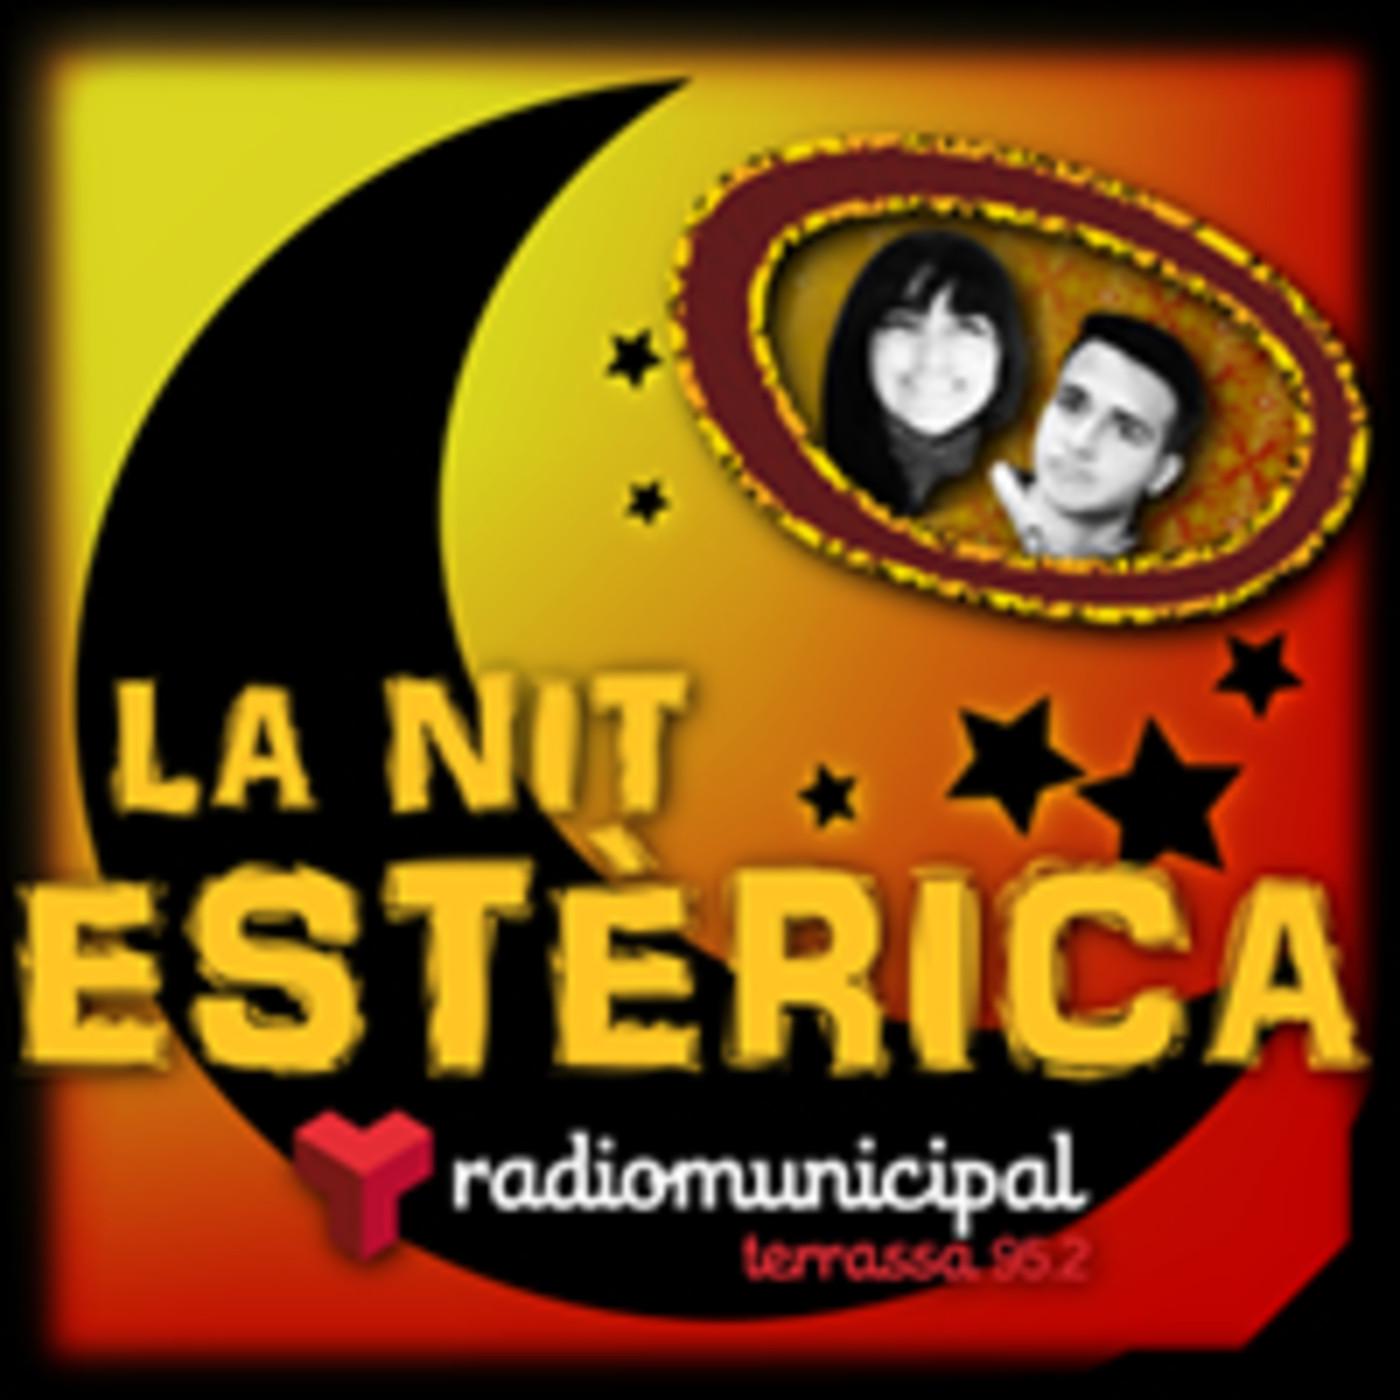 Logo La nit Estérica Radio Municipal de Terrassa